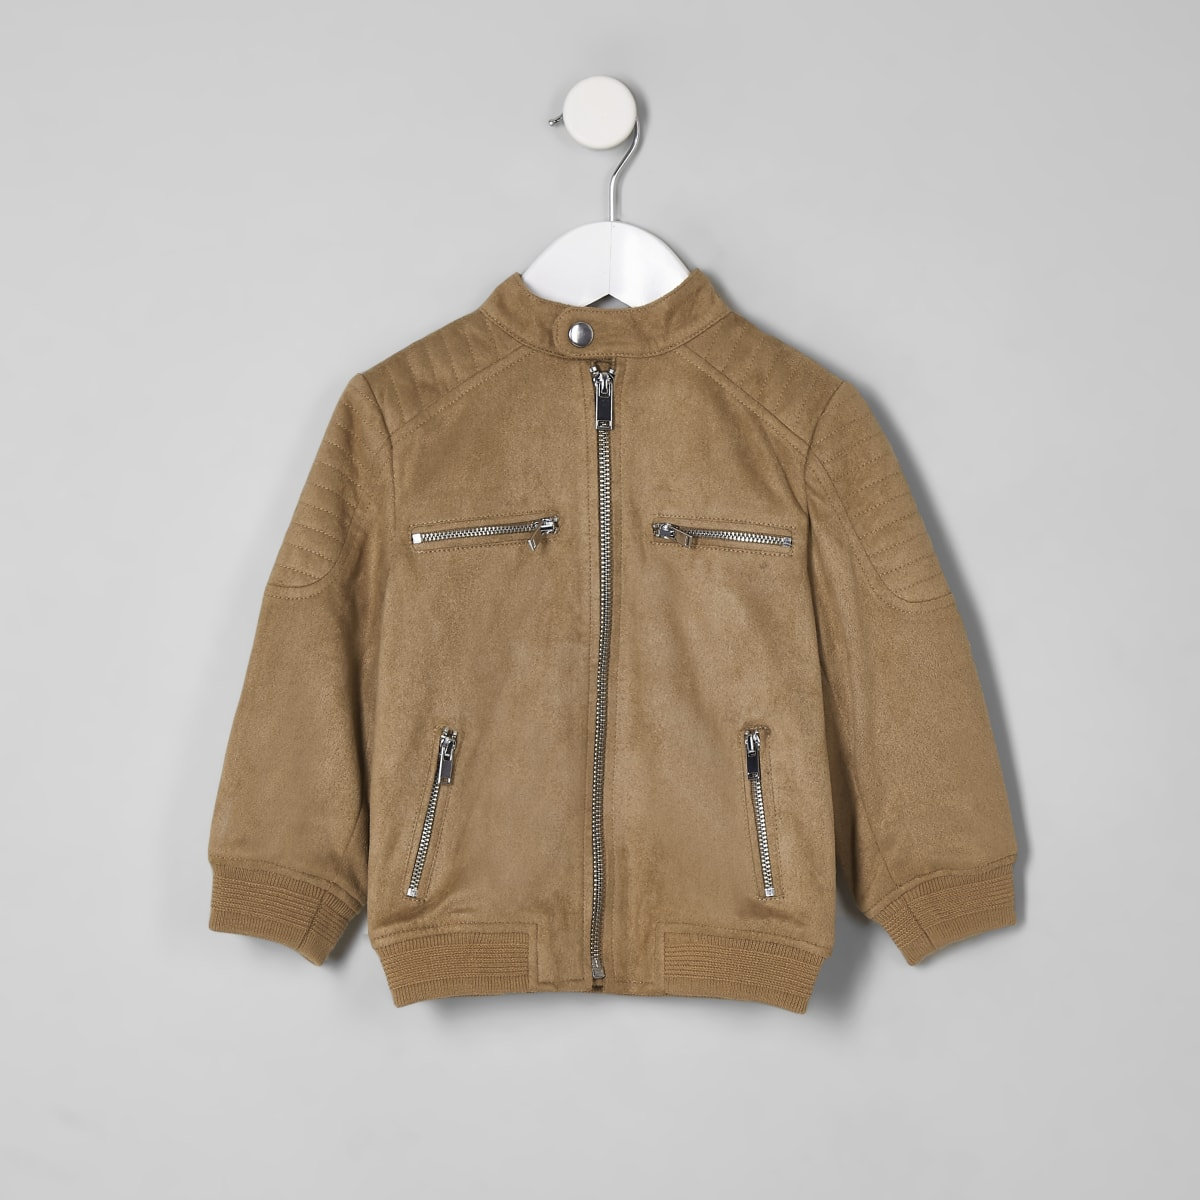 Braune Jacke aus Wildlederimitat